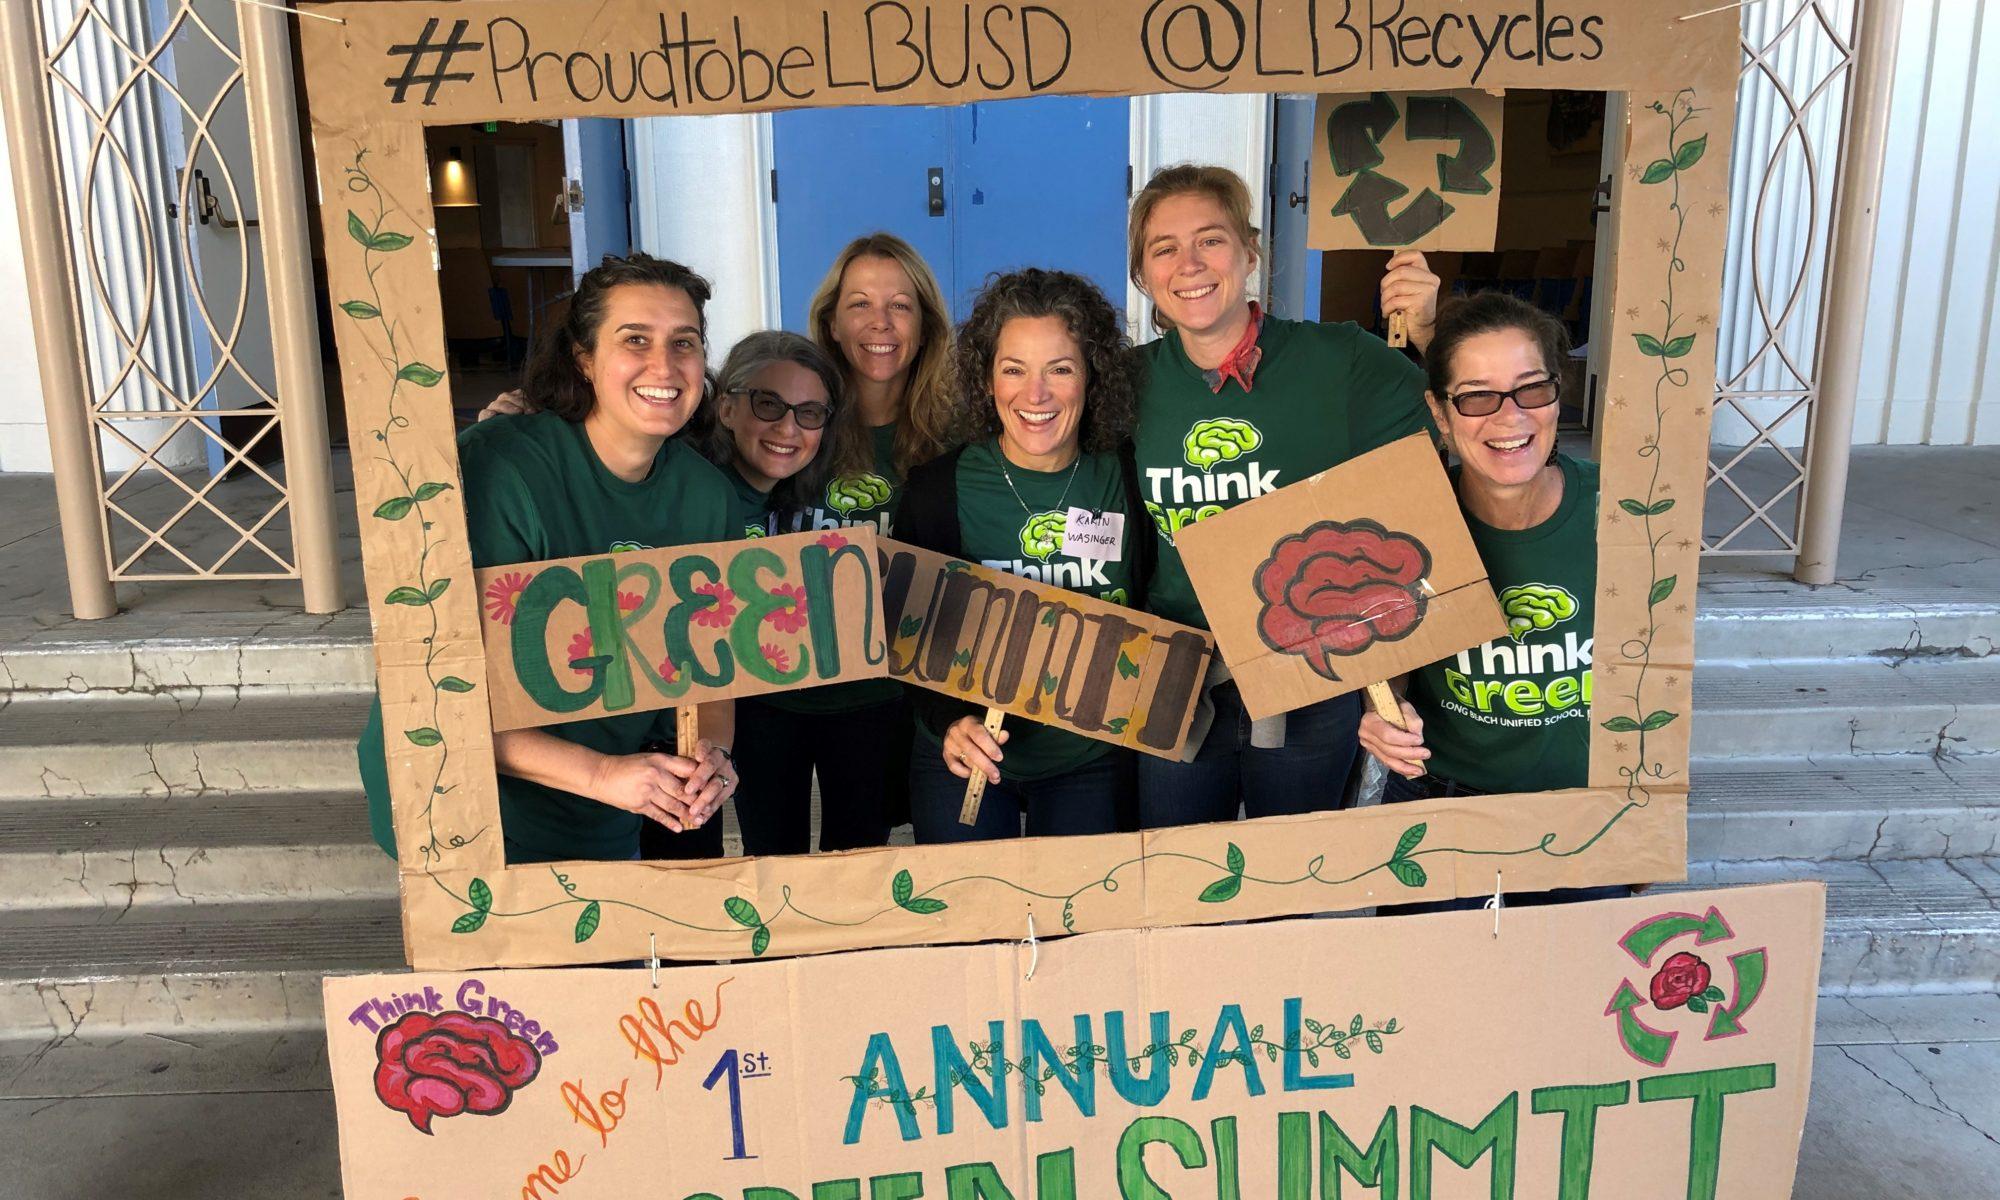 Long Beach Green Summit 2019